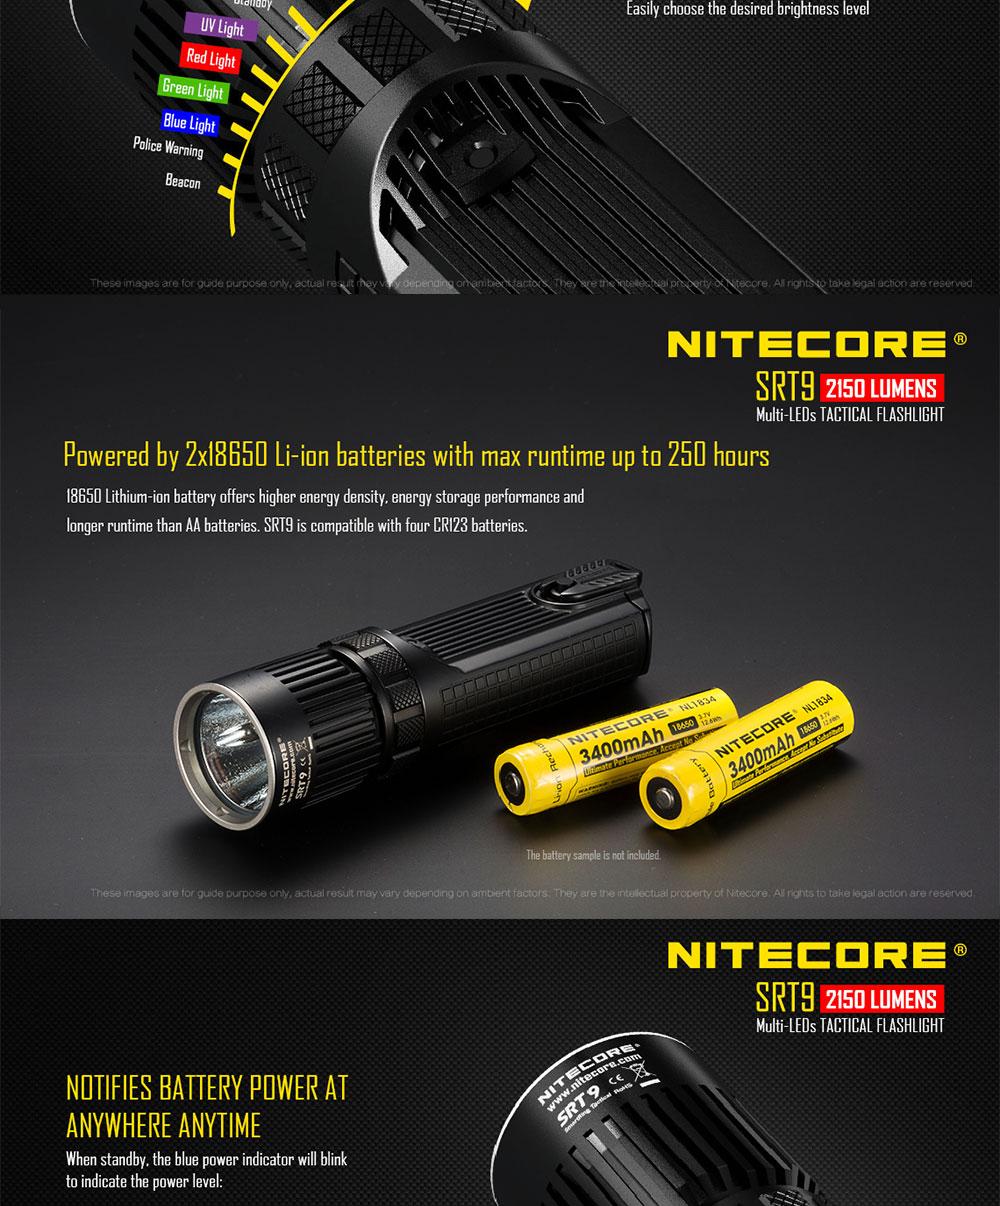 new nitecore flashlight